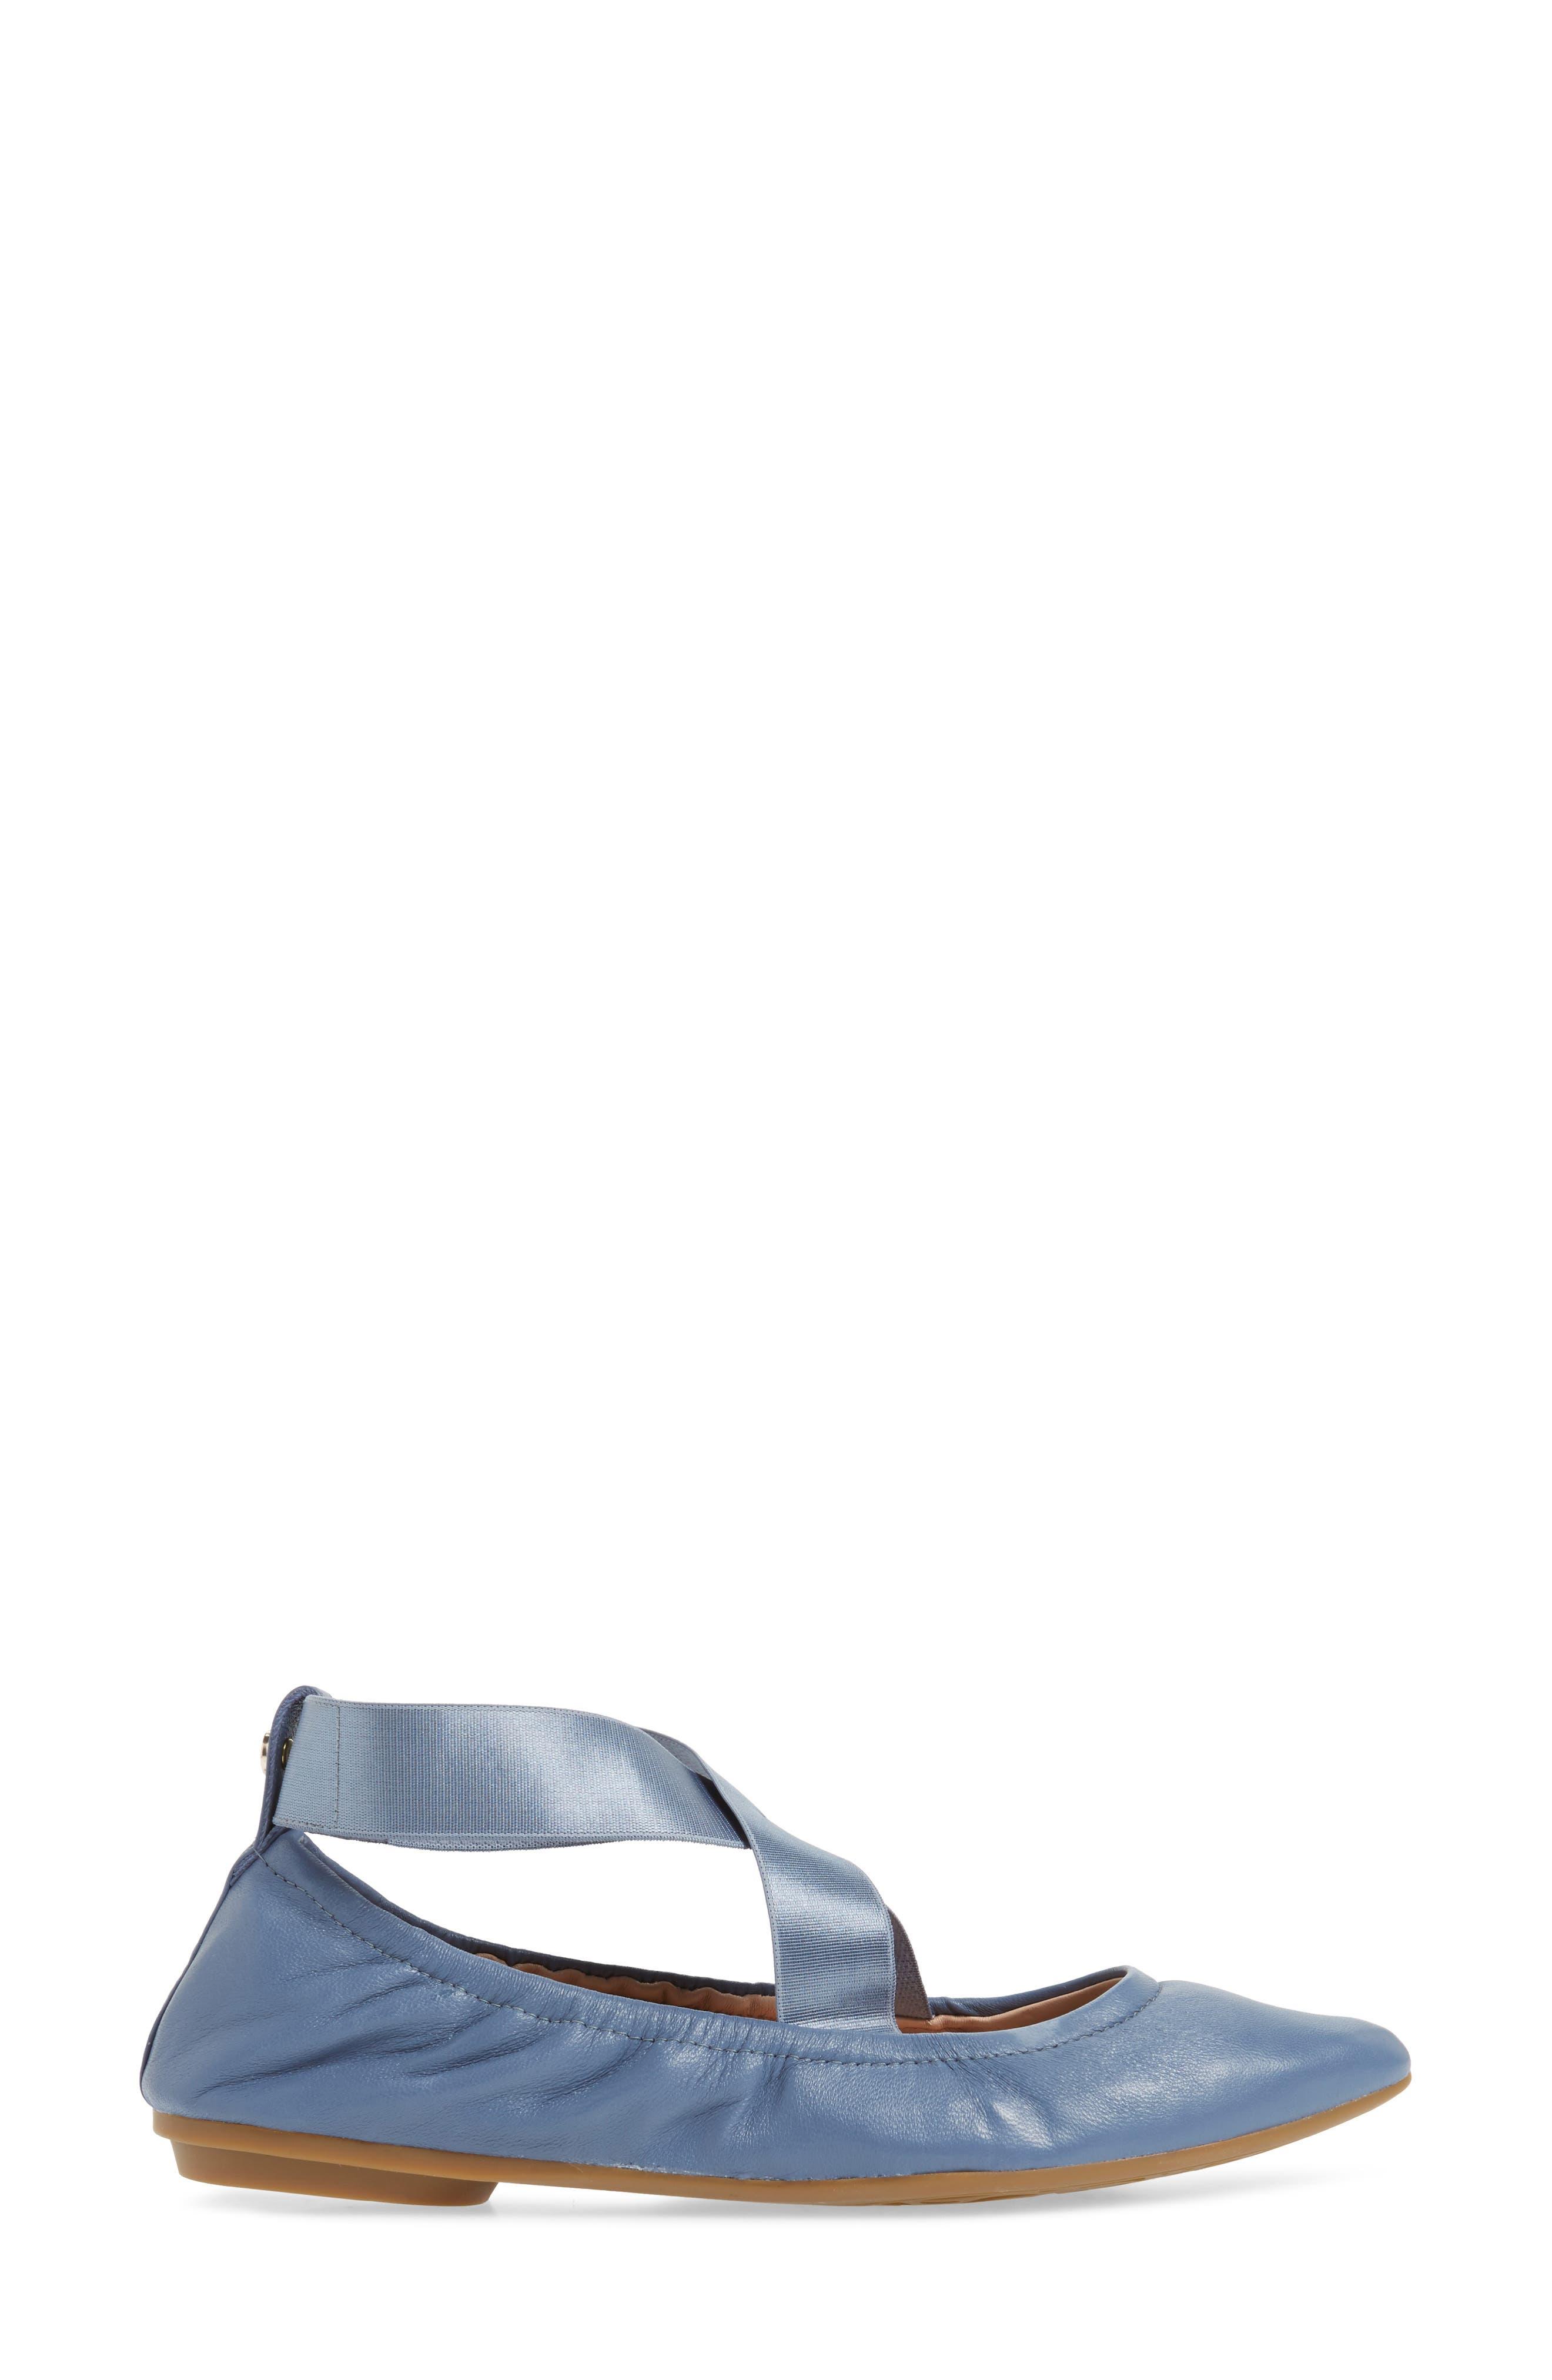 Edina Strappy Ballet Flat,                             Alternate thumbnail 13, color,